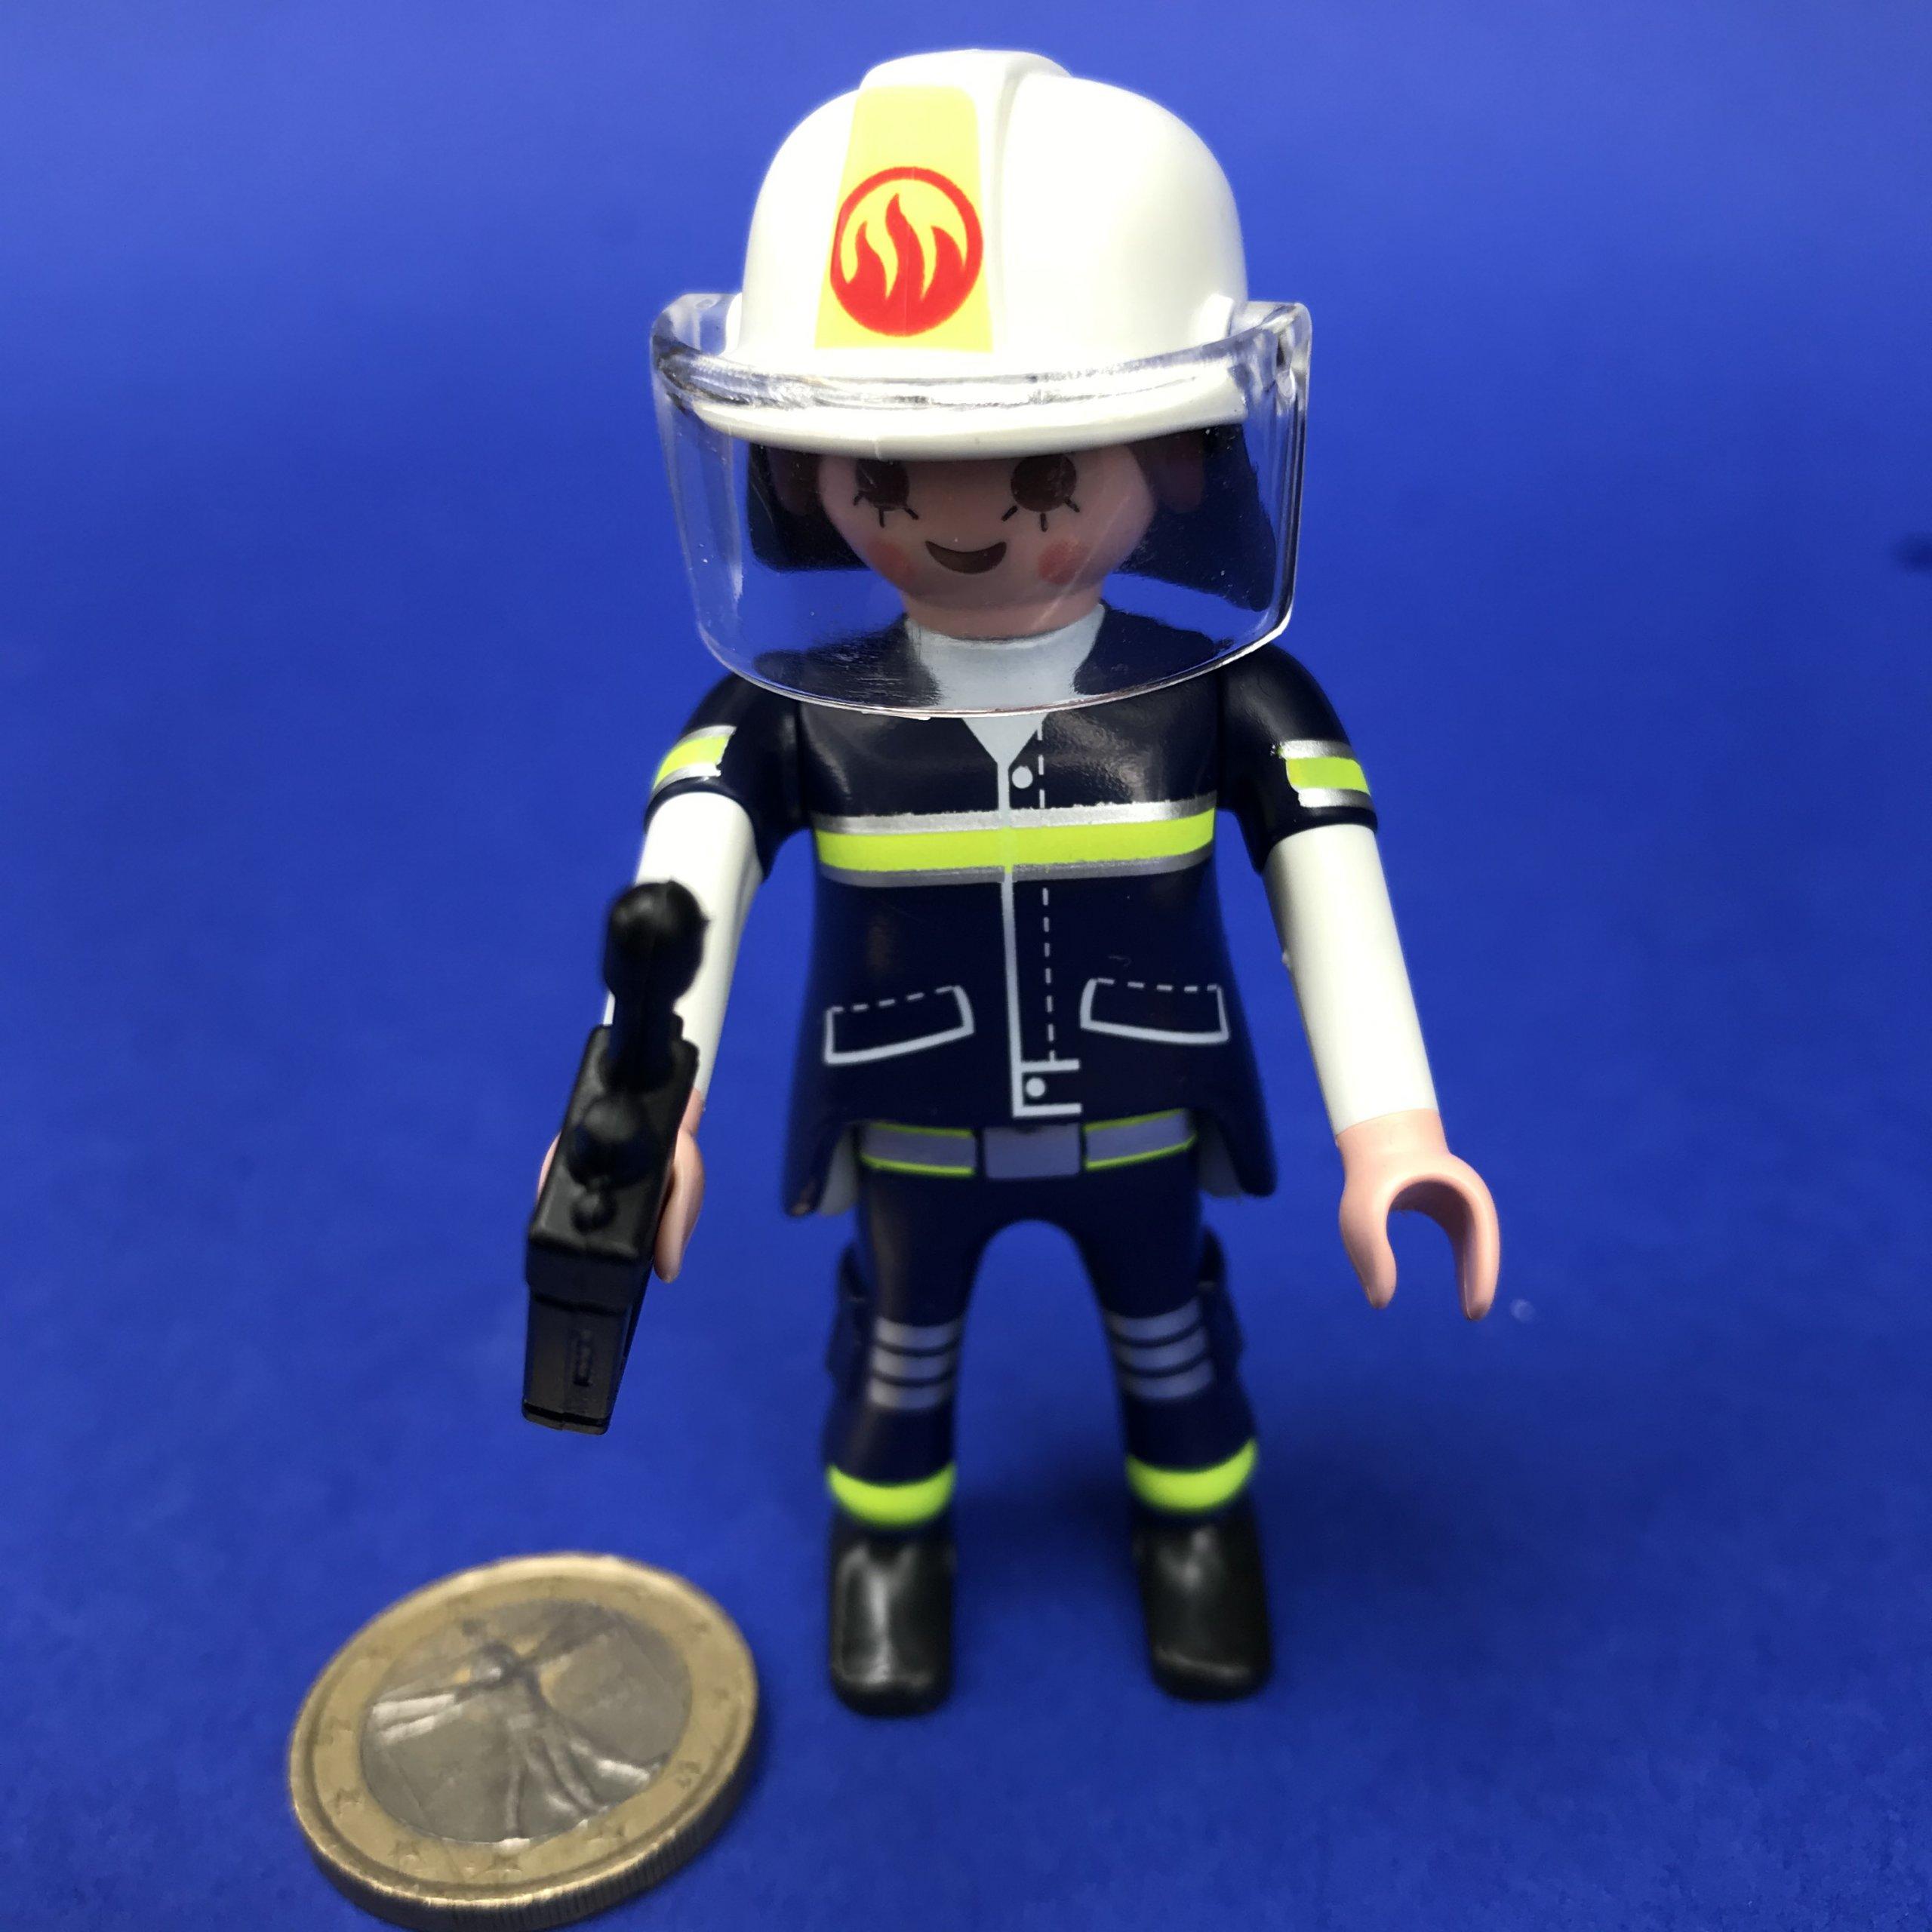 Playmobil-brandweervrouw